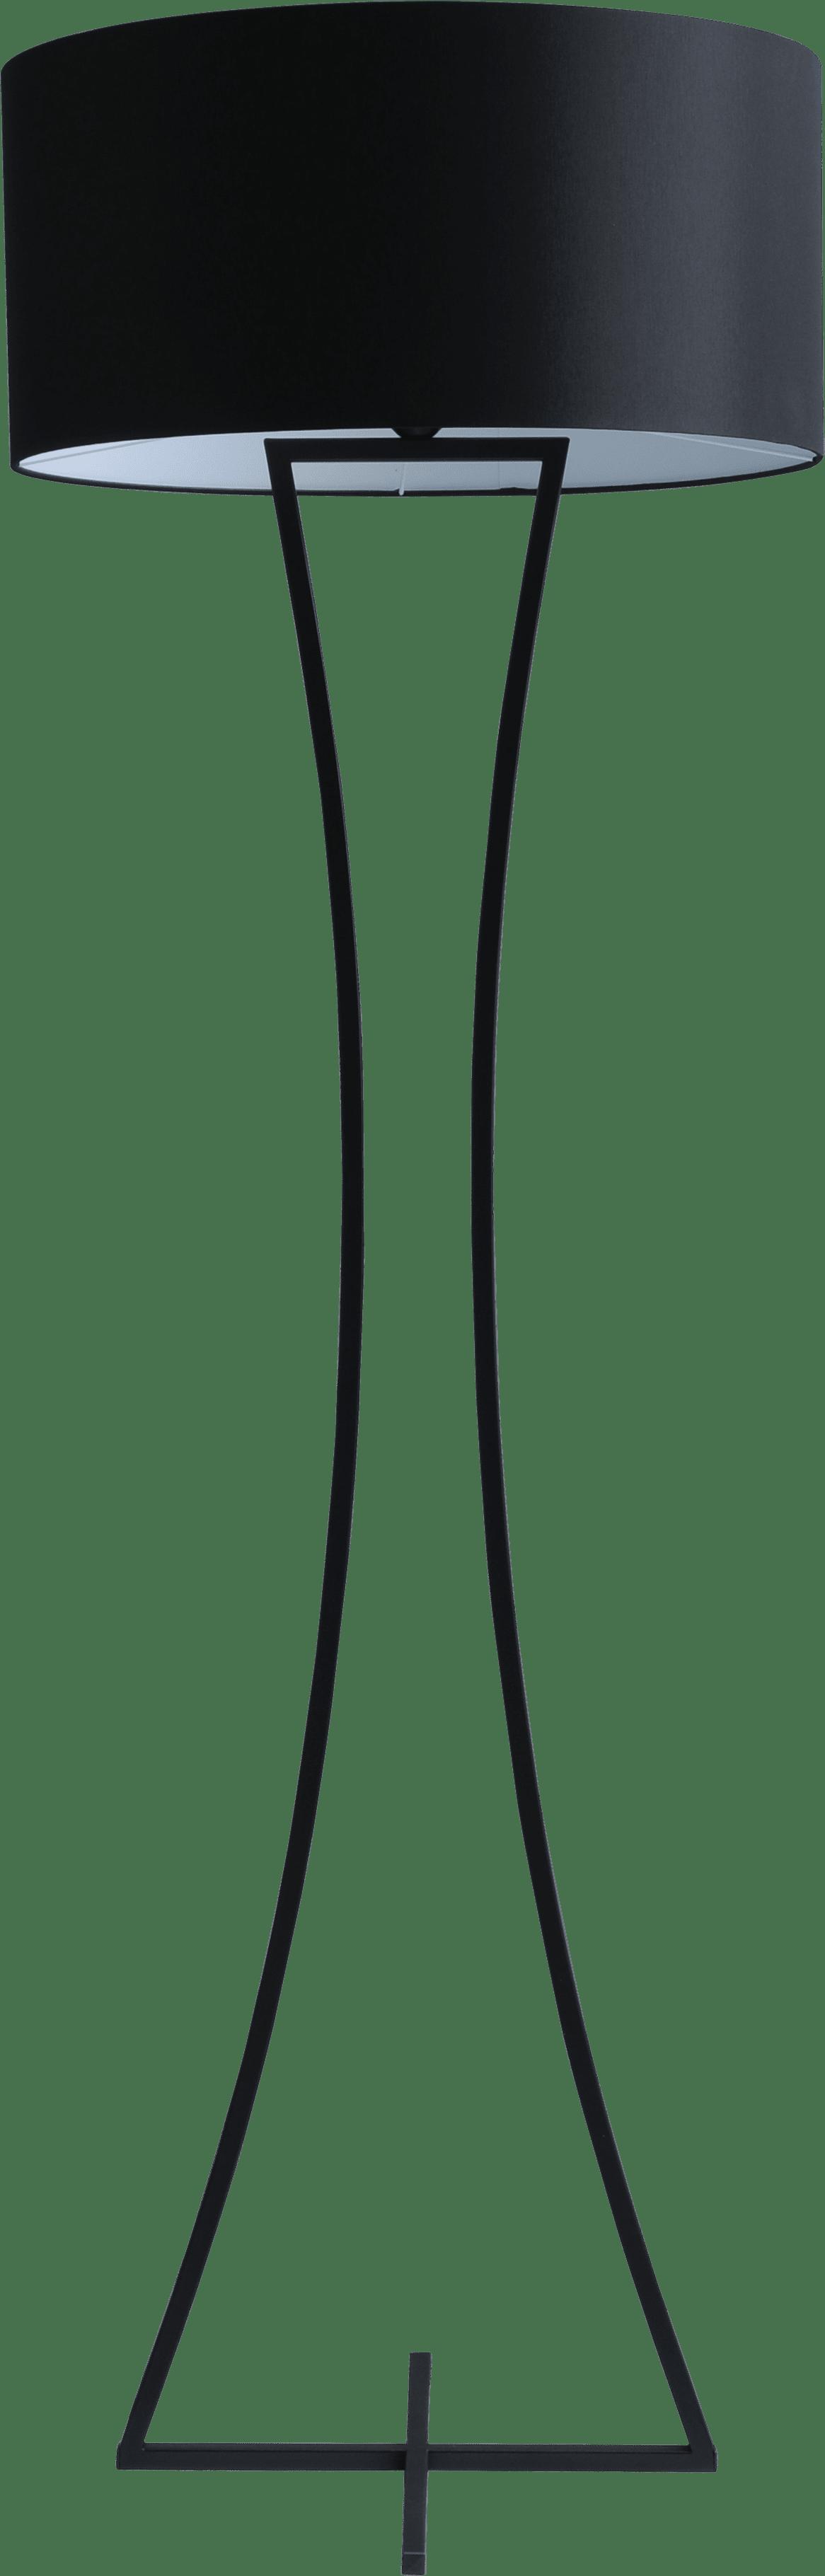 Cross VL CROSS WOMAN BLACK STRUCT. H.158CM